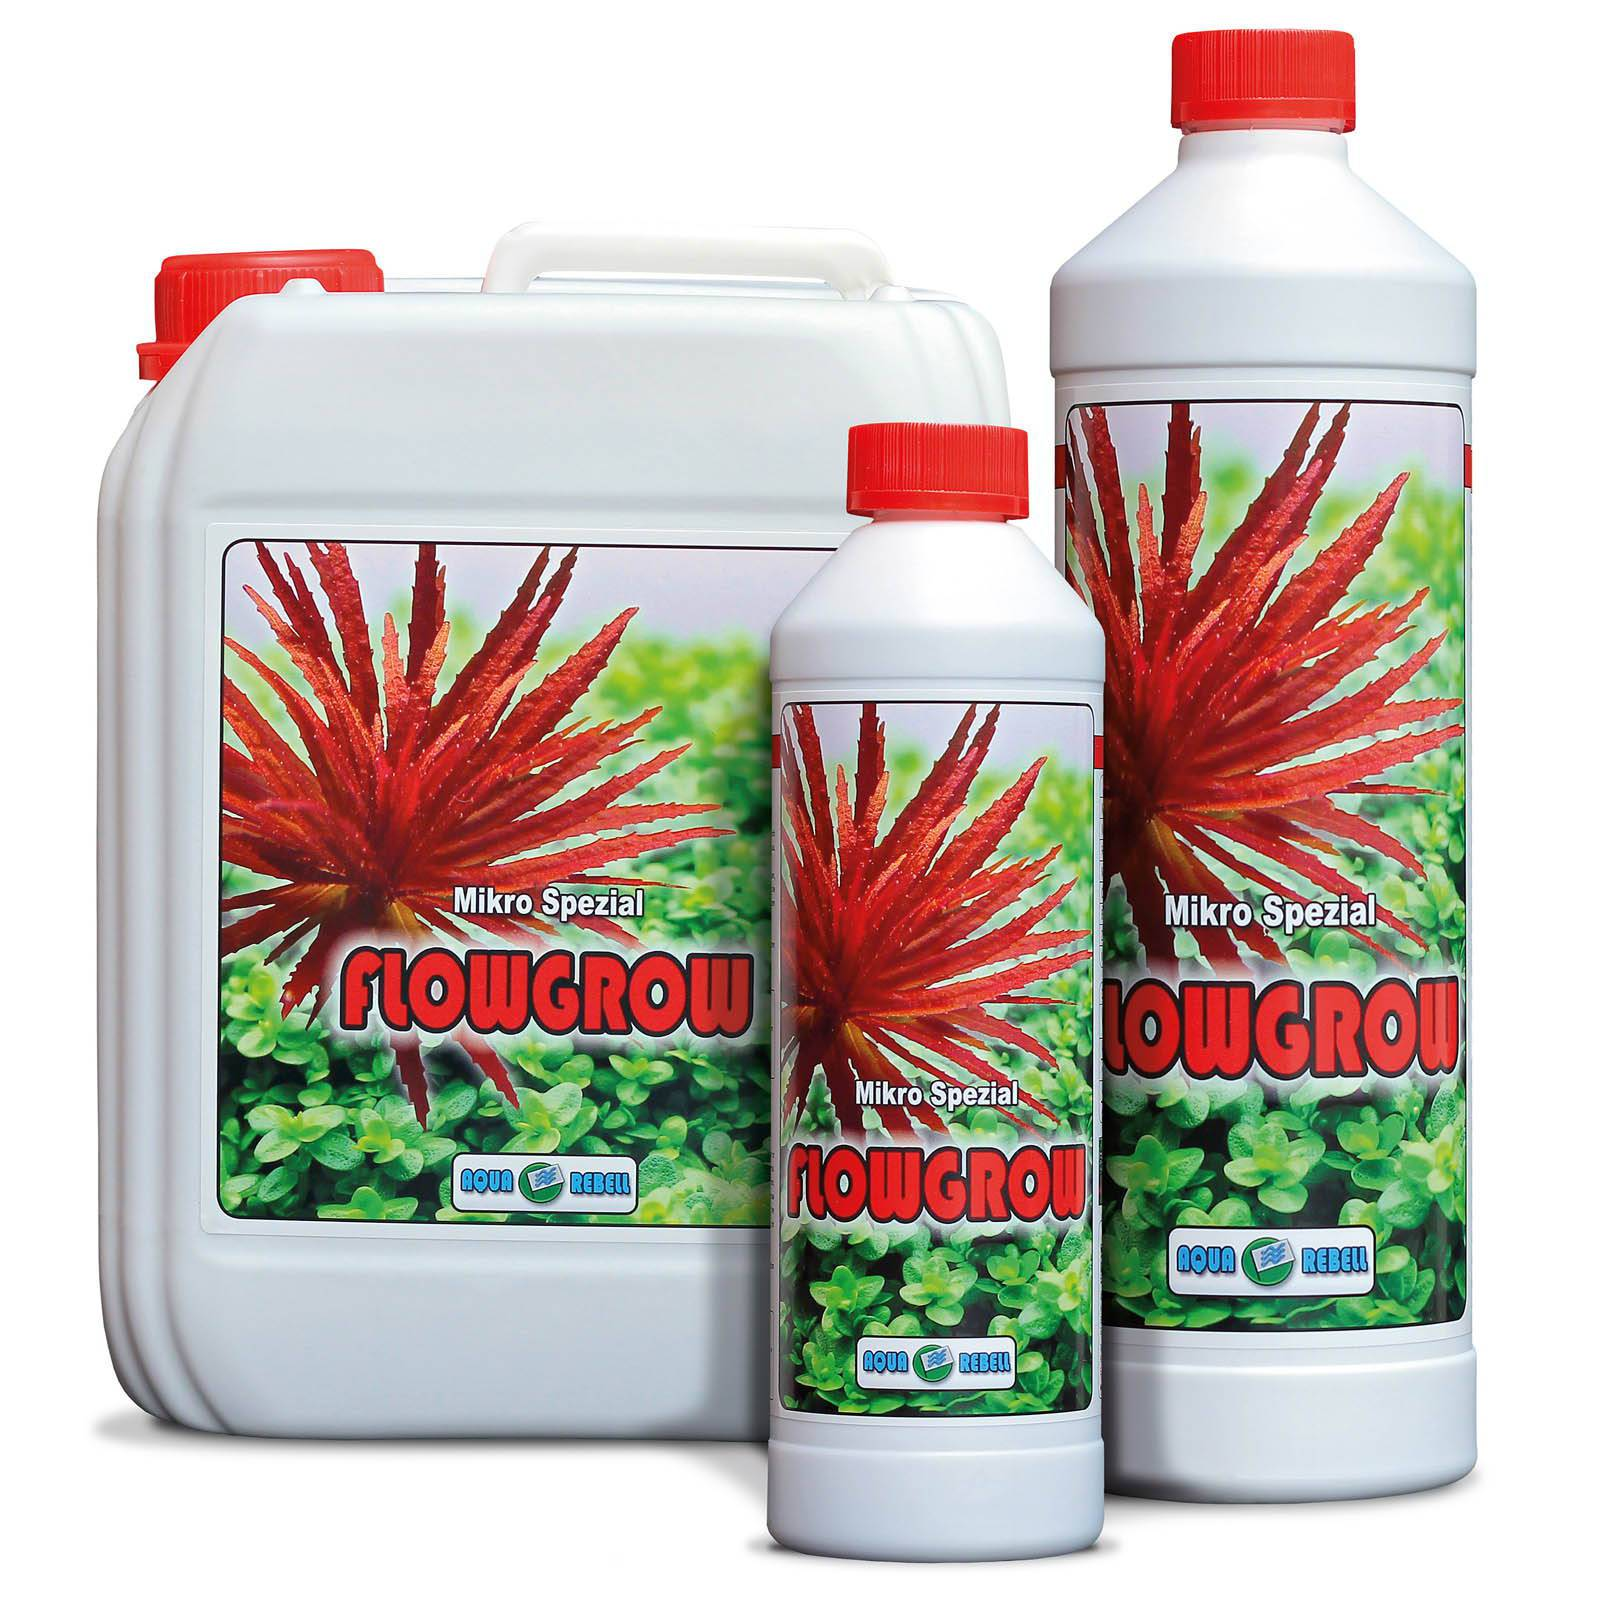 Flowgrow Mikro-Spezial